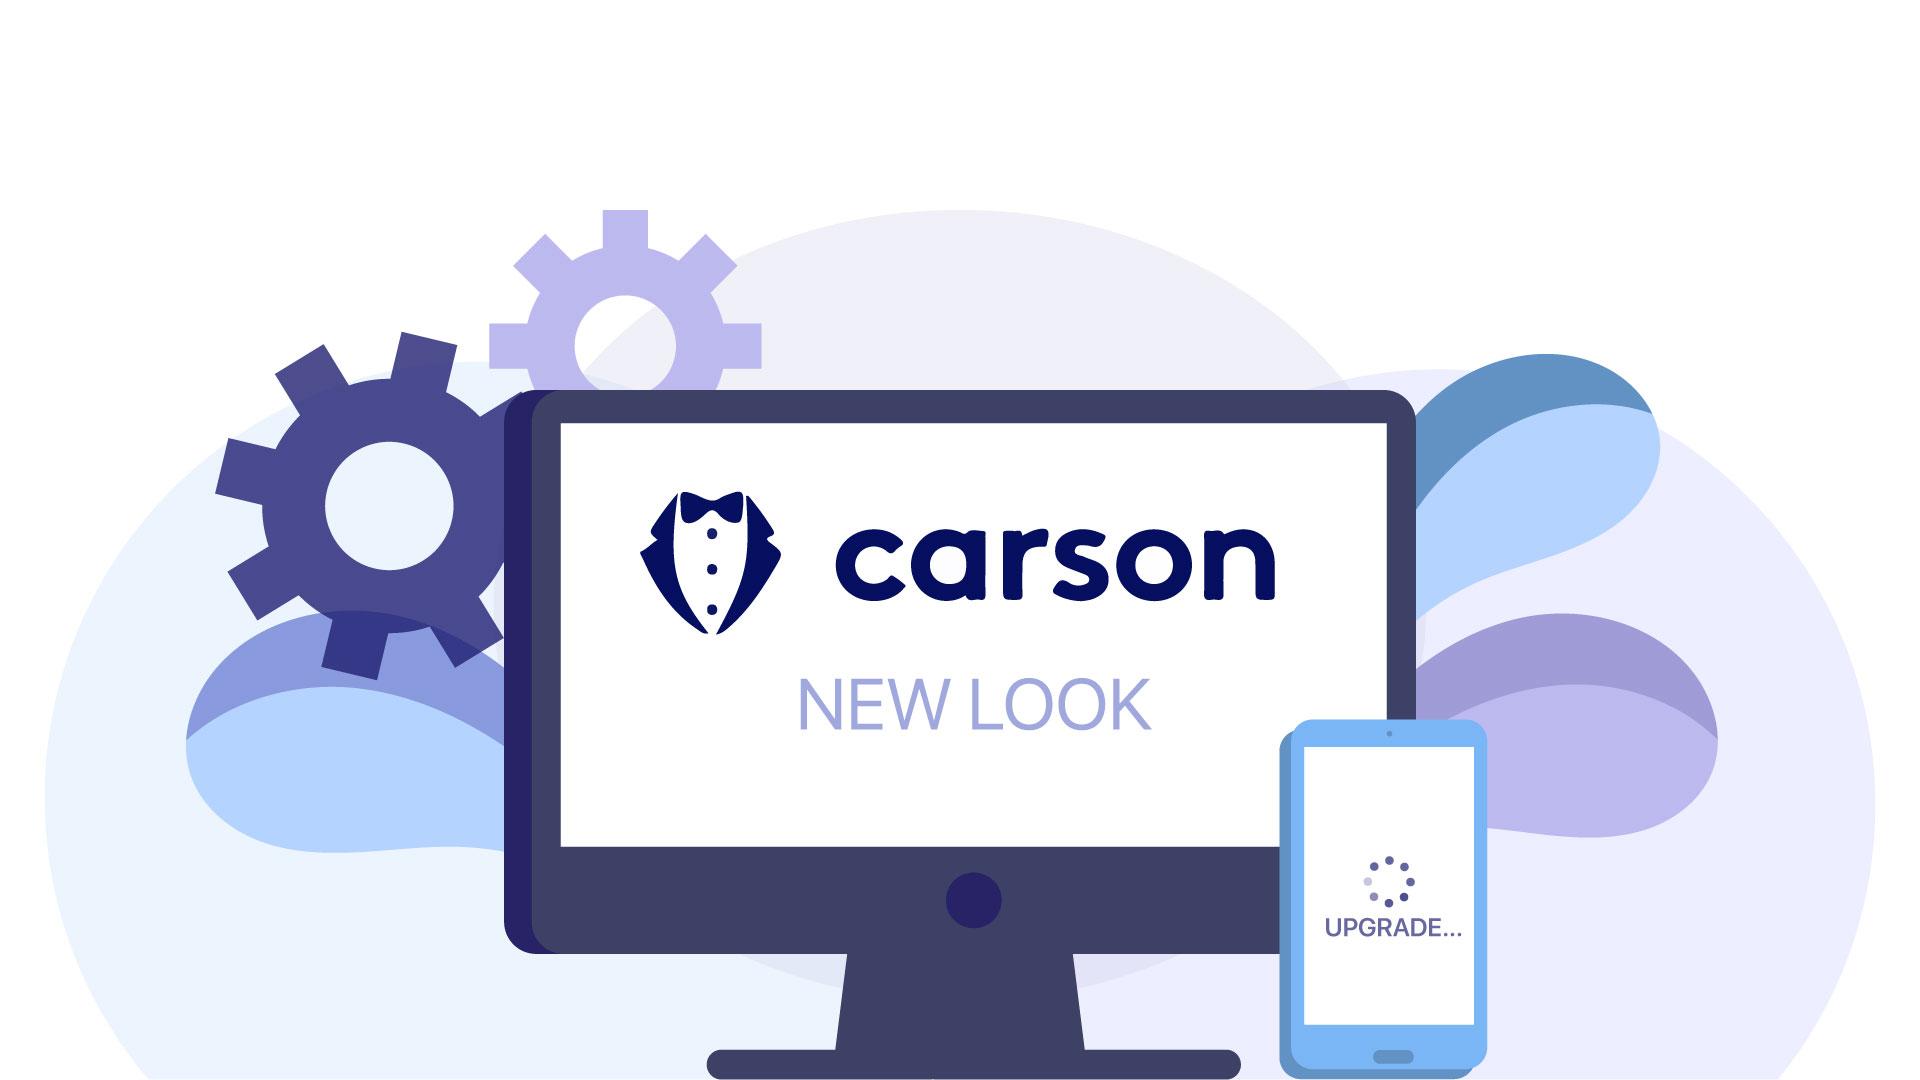 HeyCarson has a New Look!